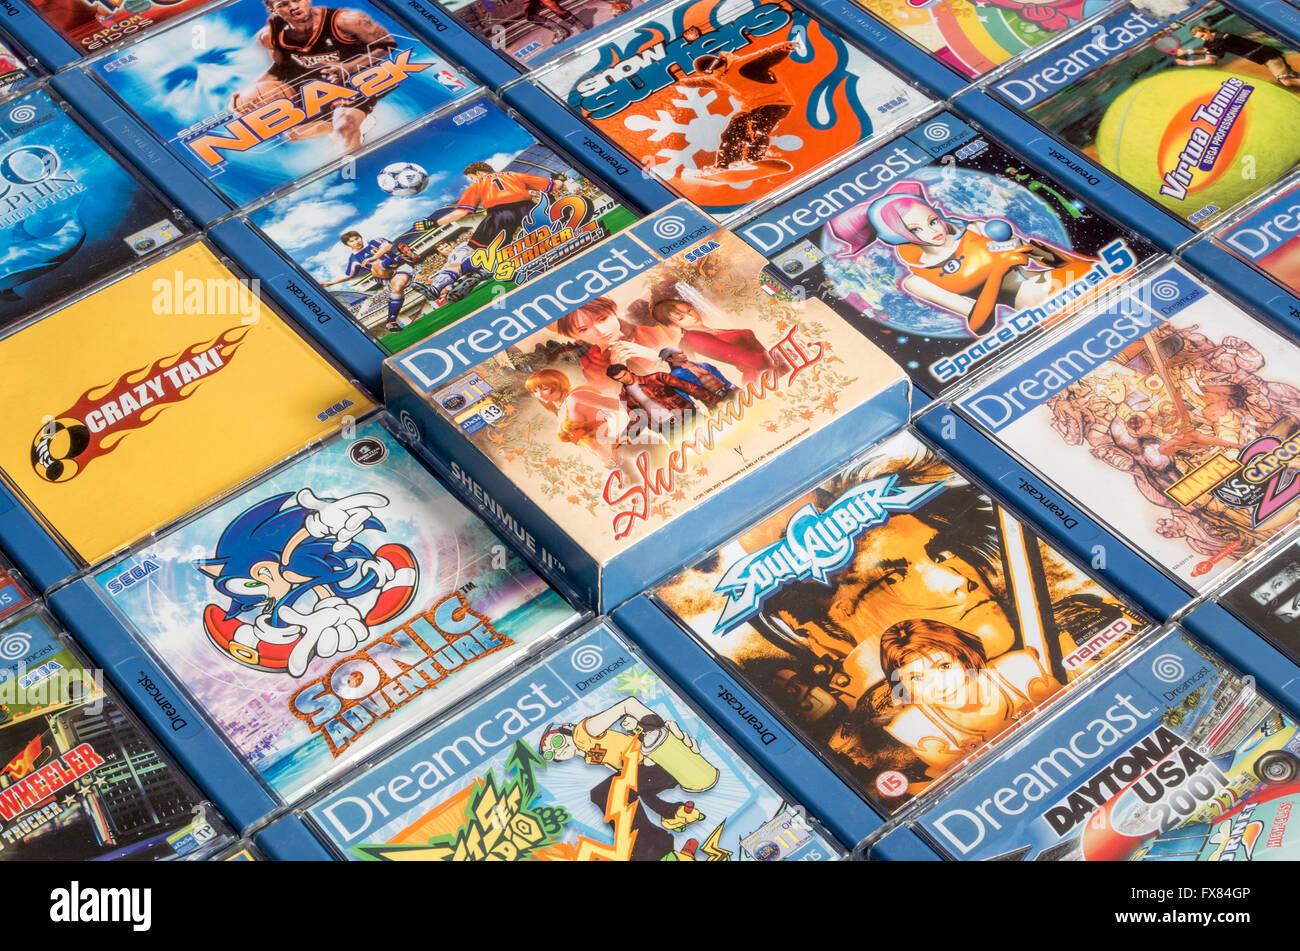 Sega Dreamcast games including Shenmue II, Sonic Adventure